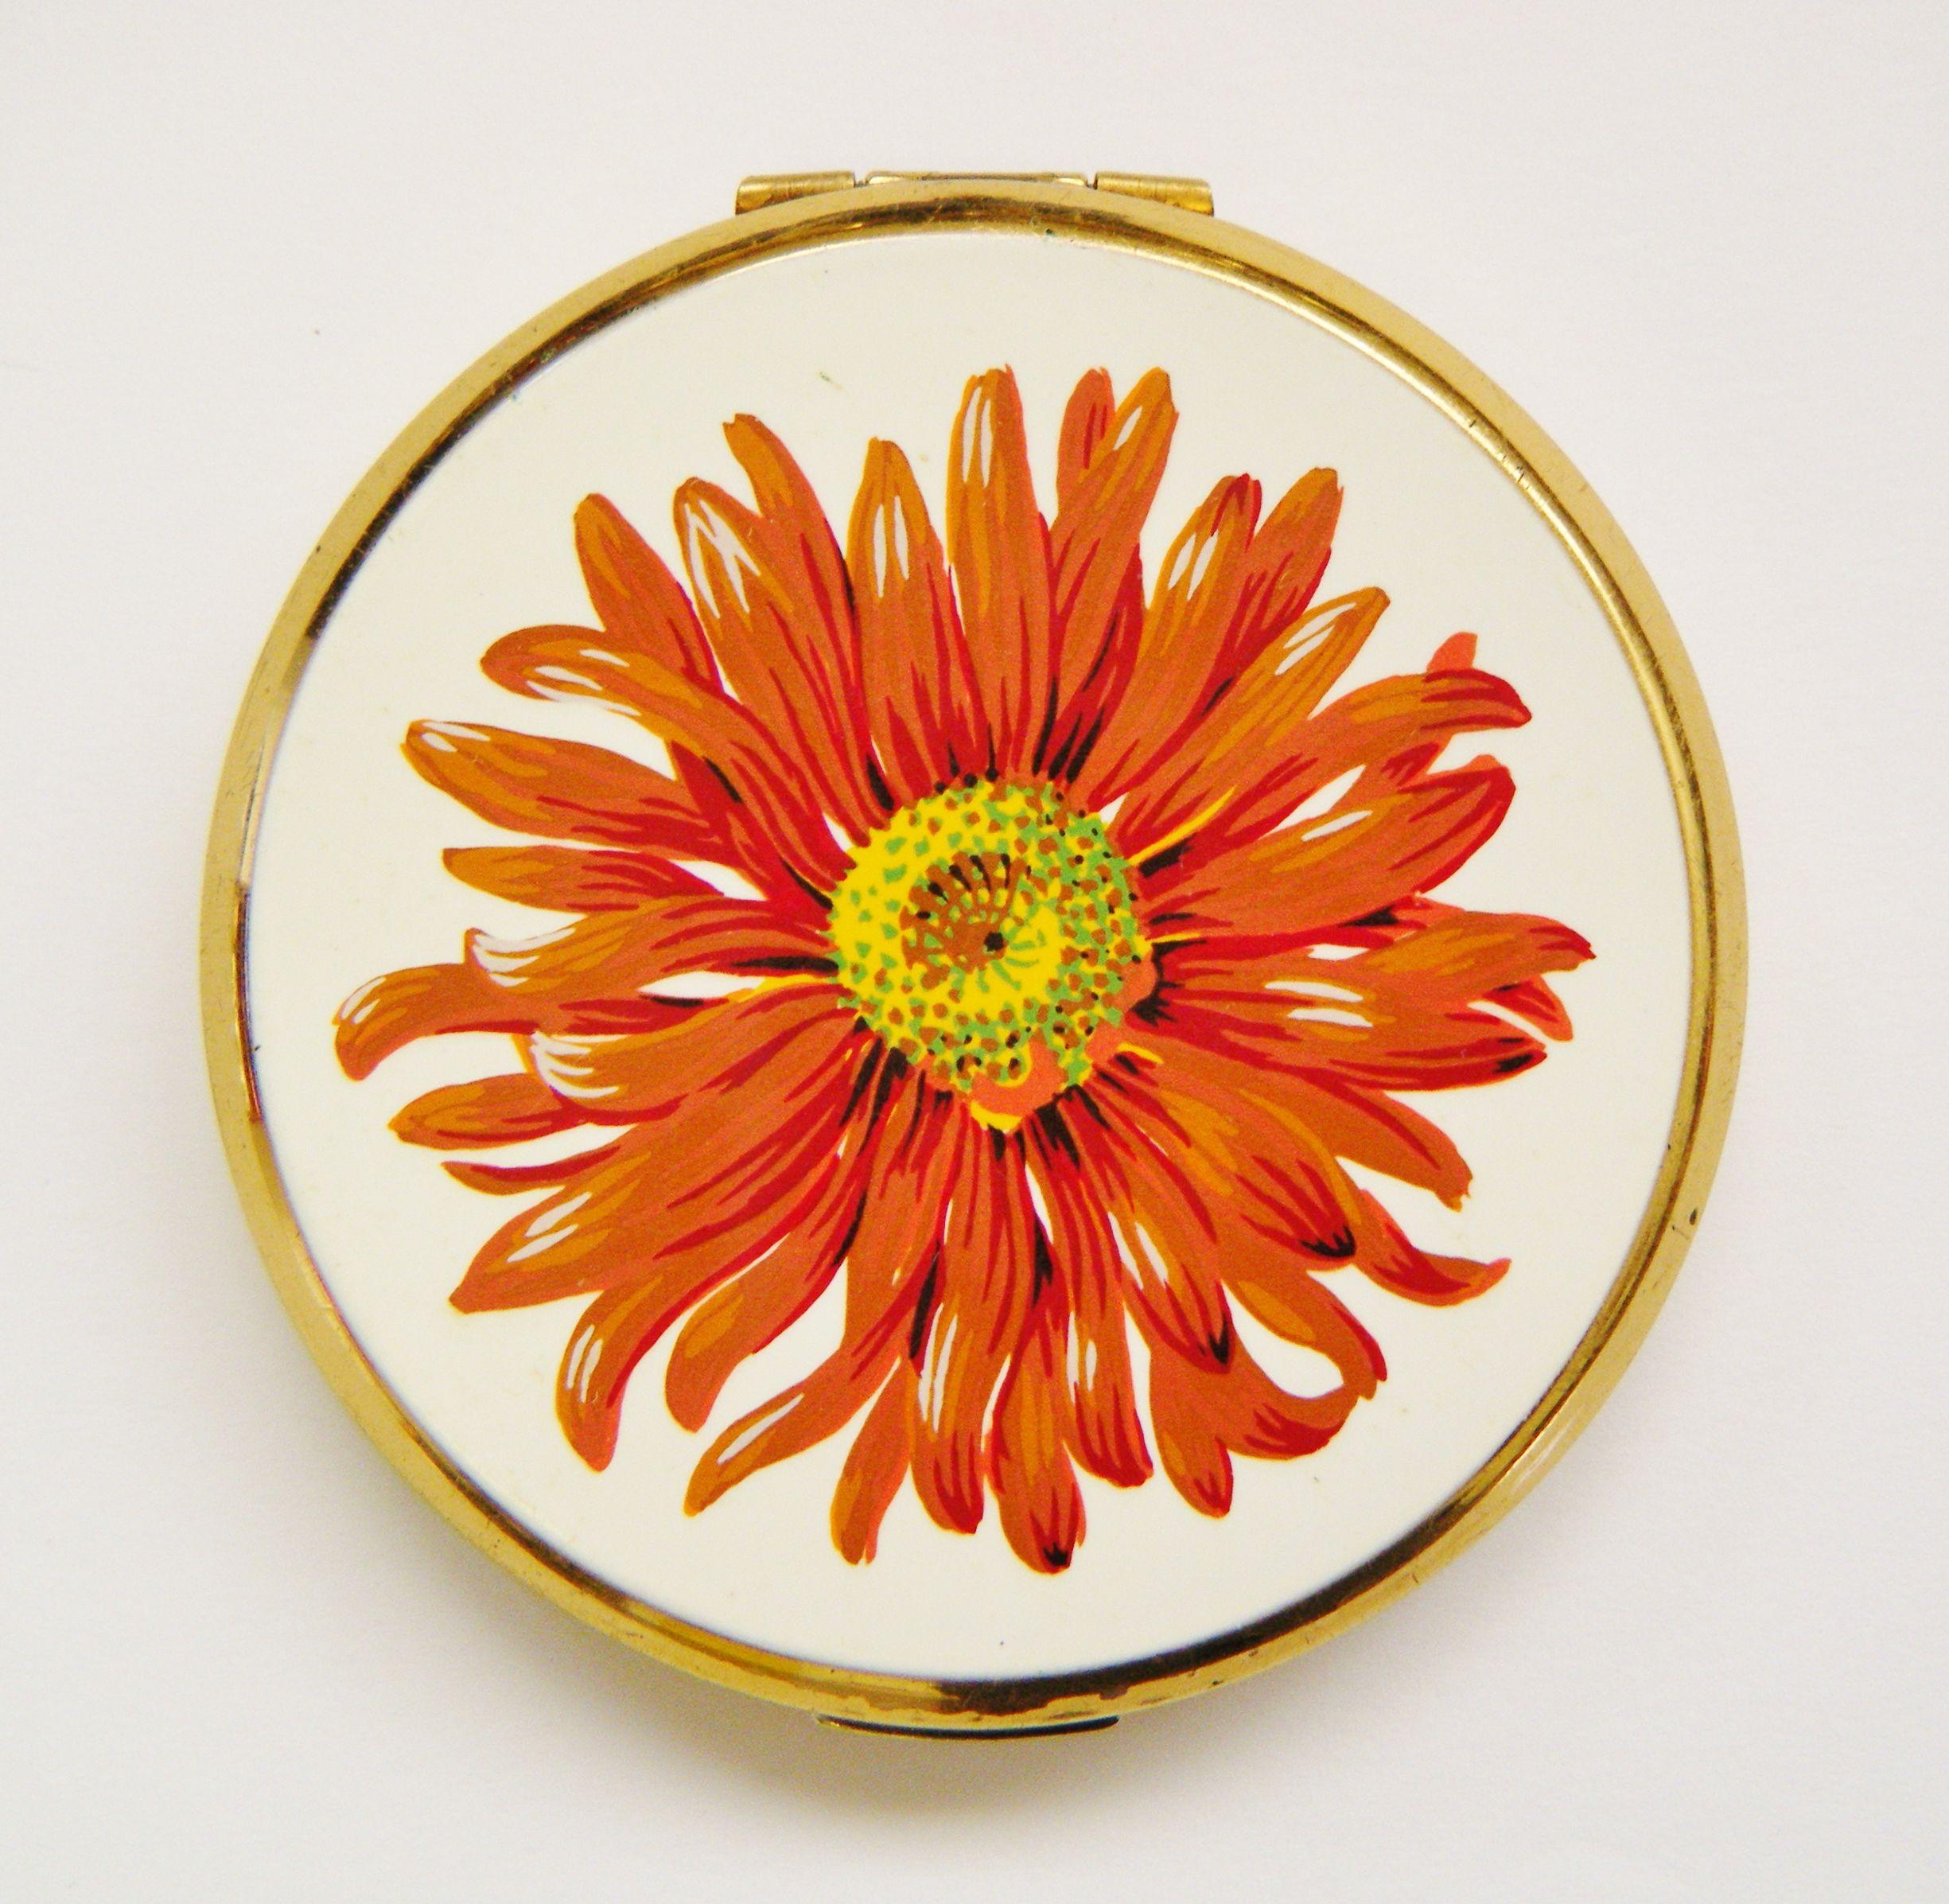 Orange Flower Stratton Compact Compact shop, Sunflower